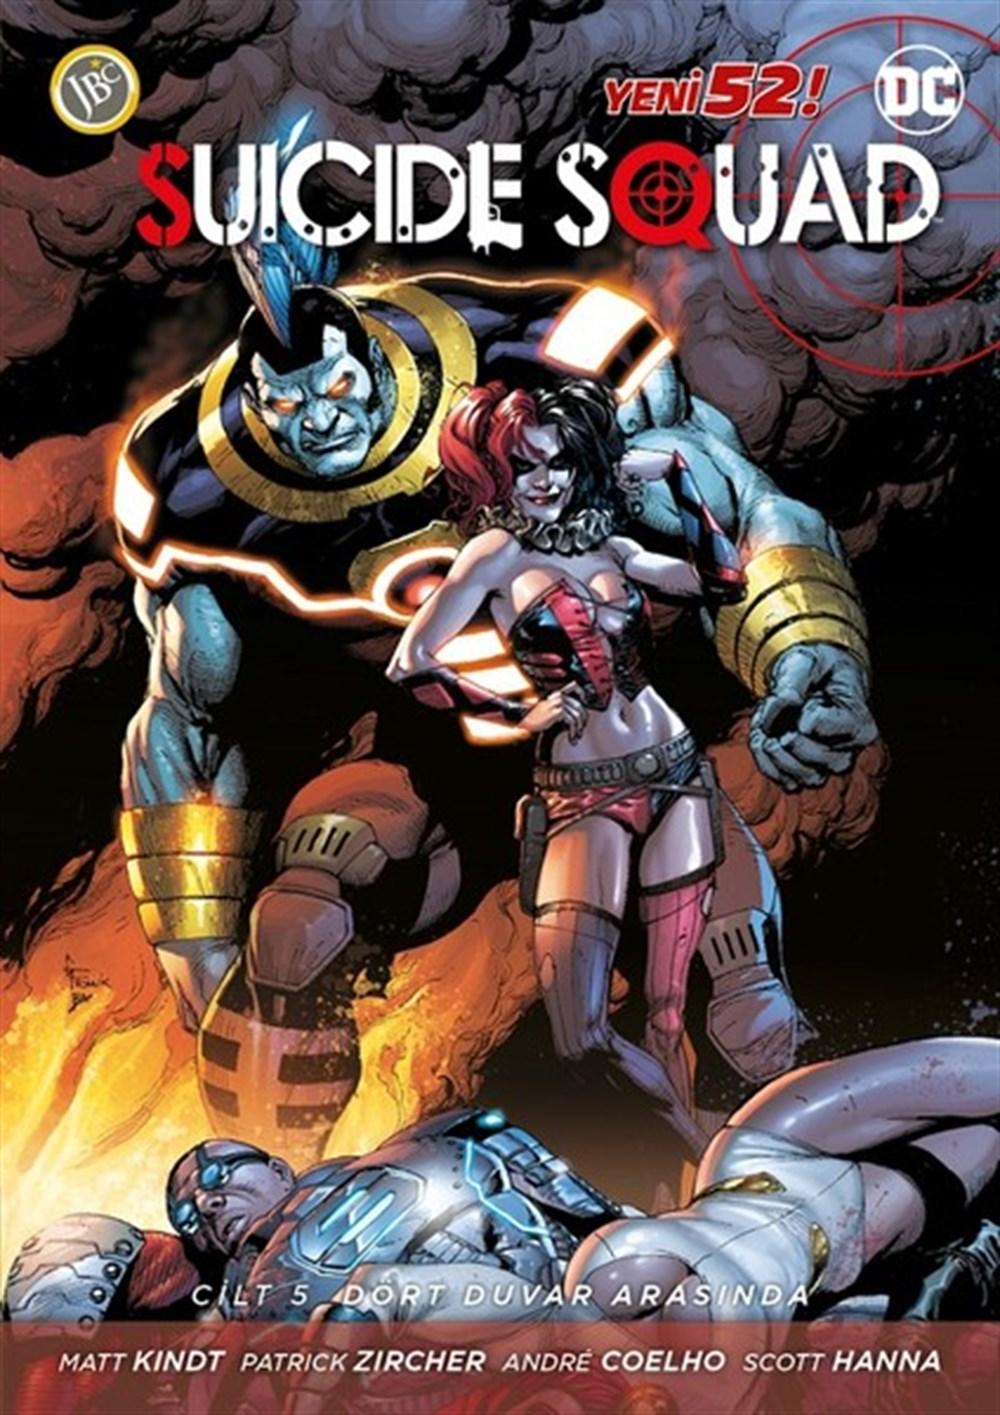 Suicide Squad Yeni 52 Cilt 5: Dört Duvar Arasında